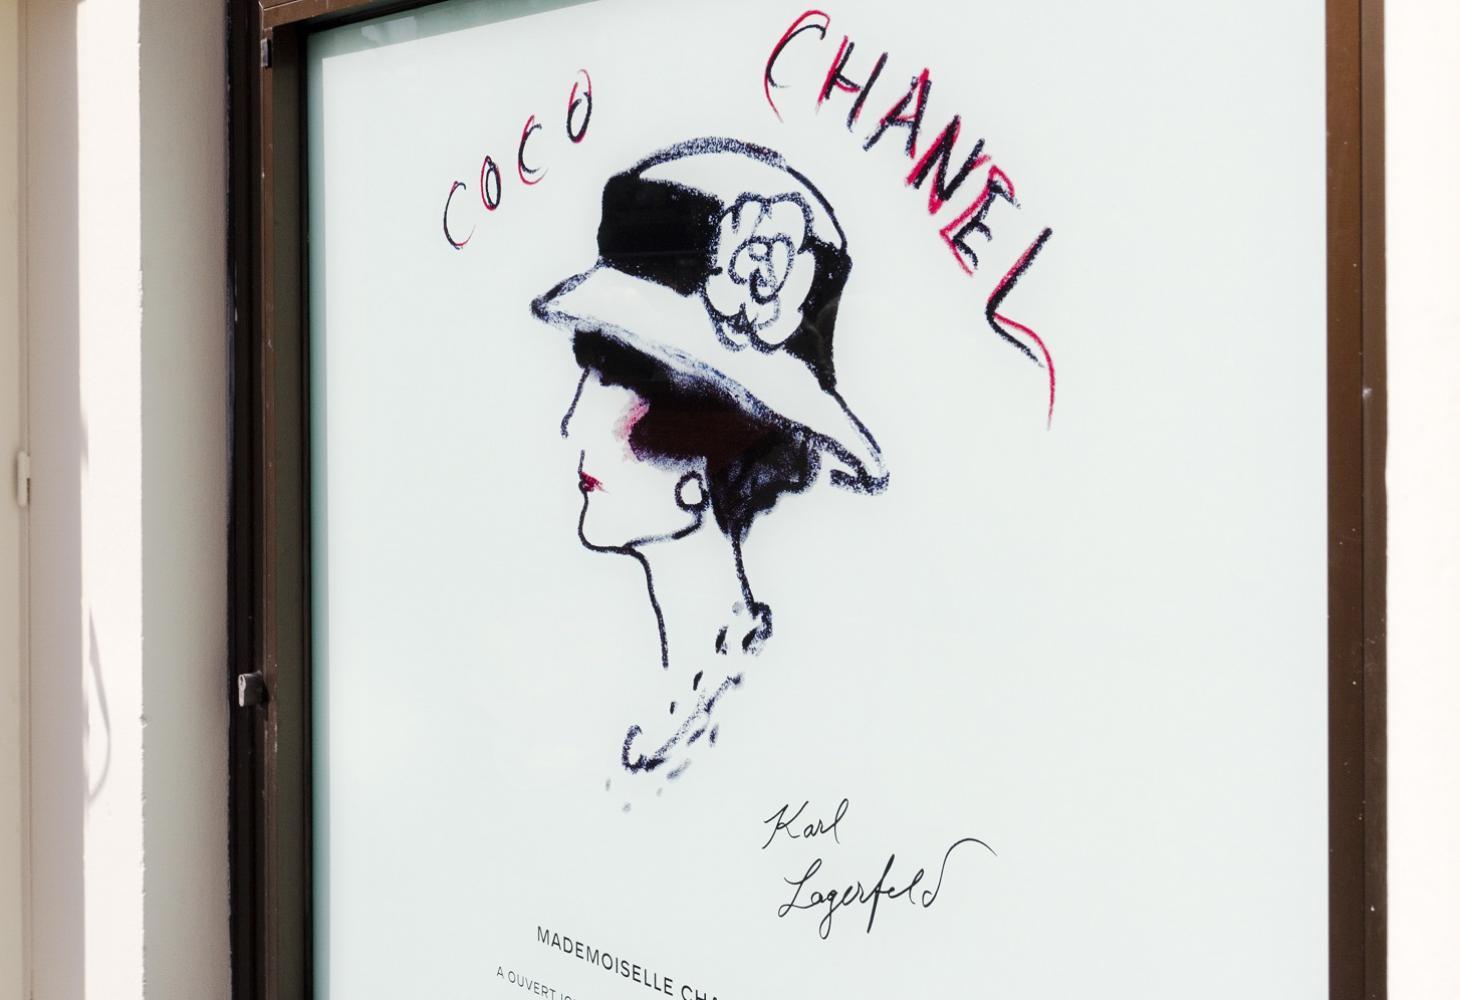 Plaque Chanel